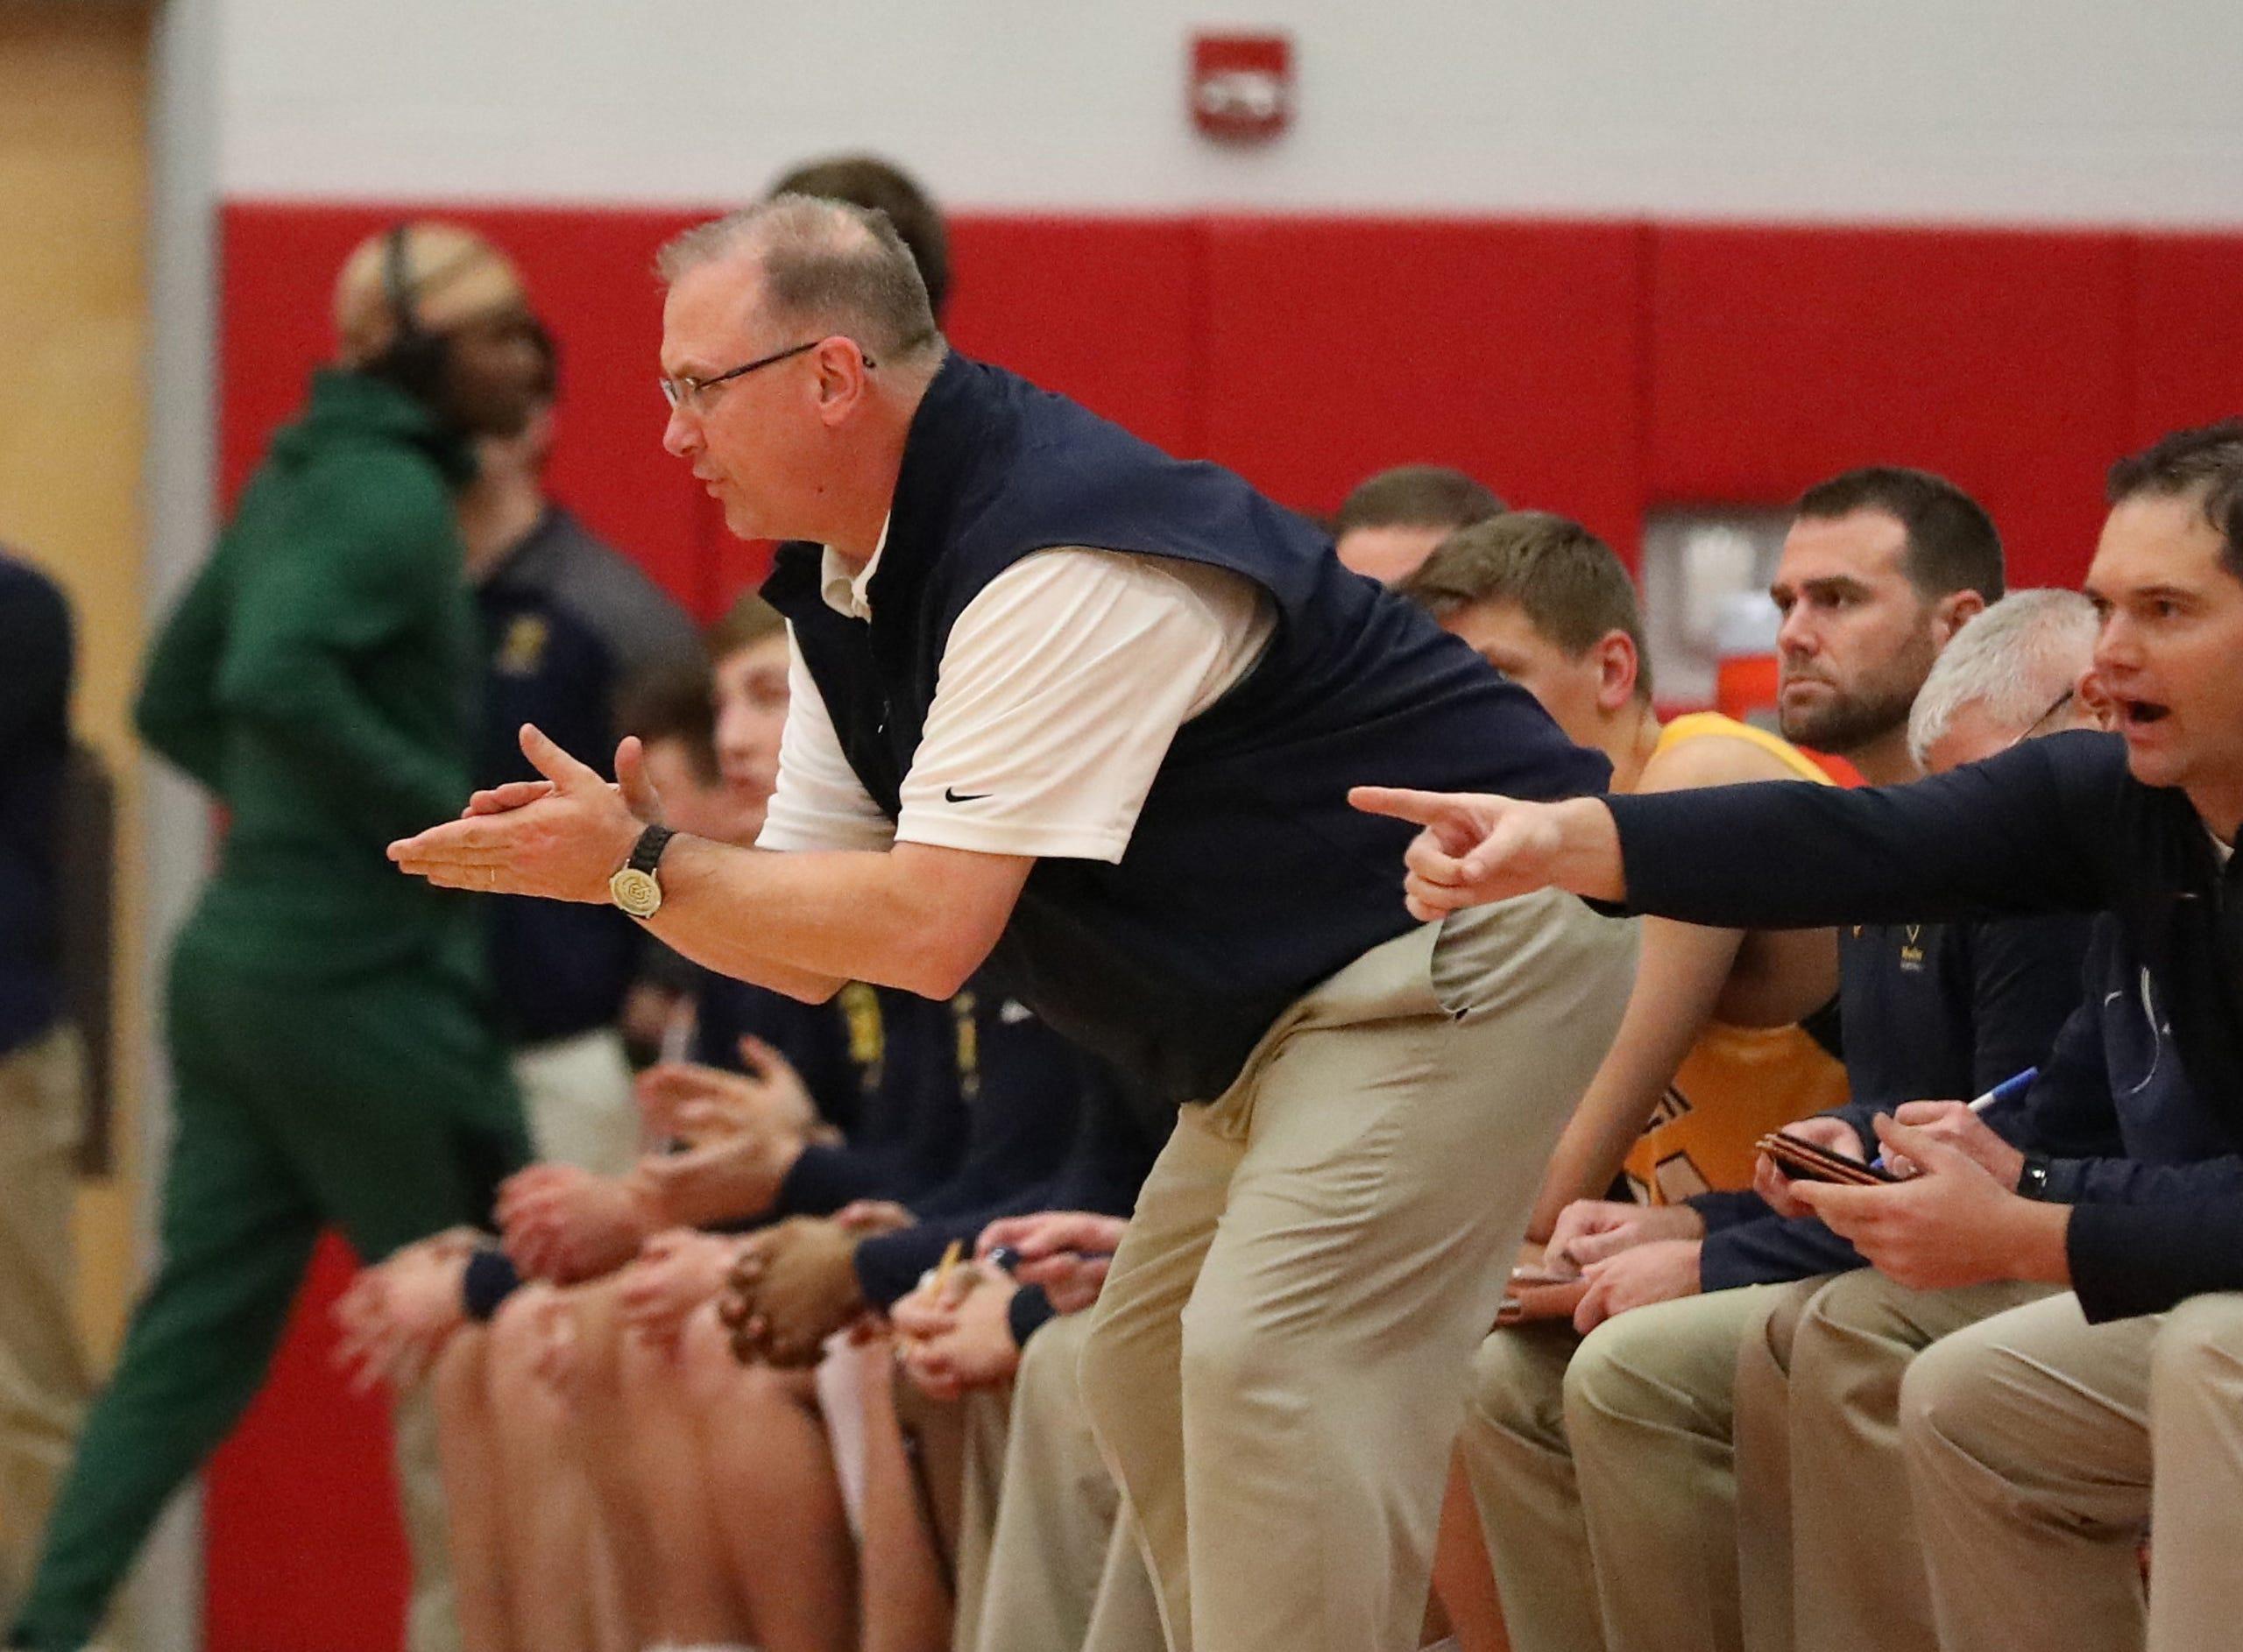 PHOTOS: AP 2019 boys high school basketball all-district teams